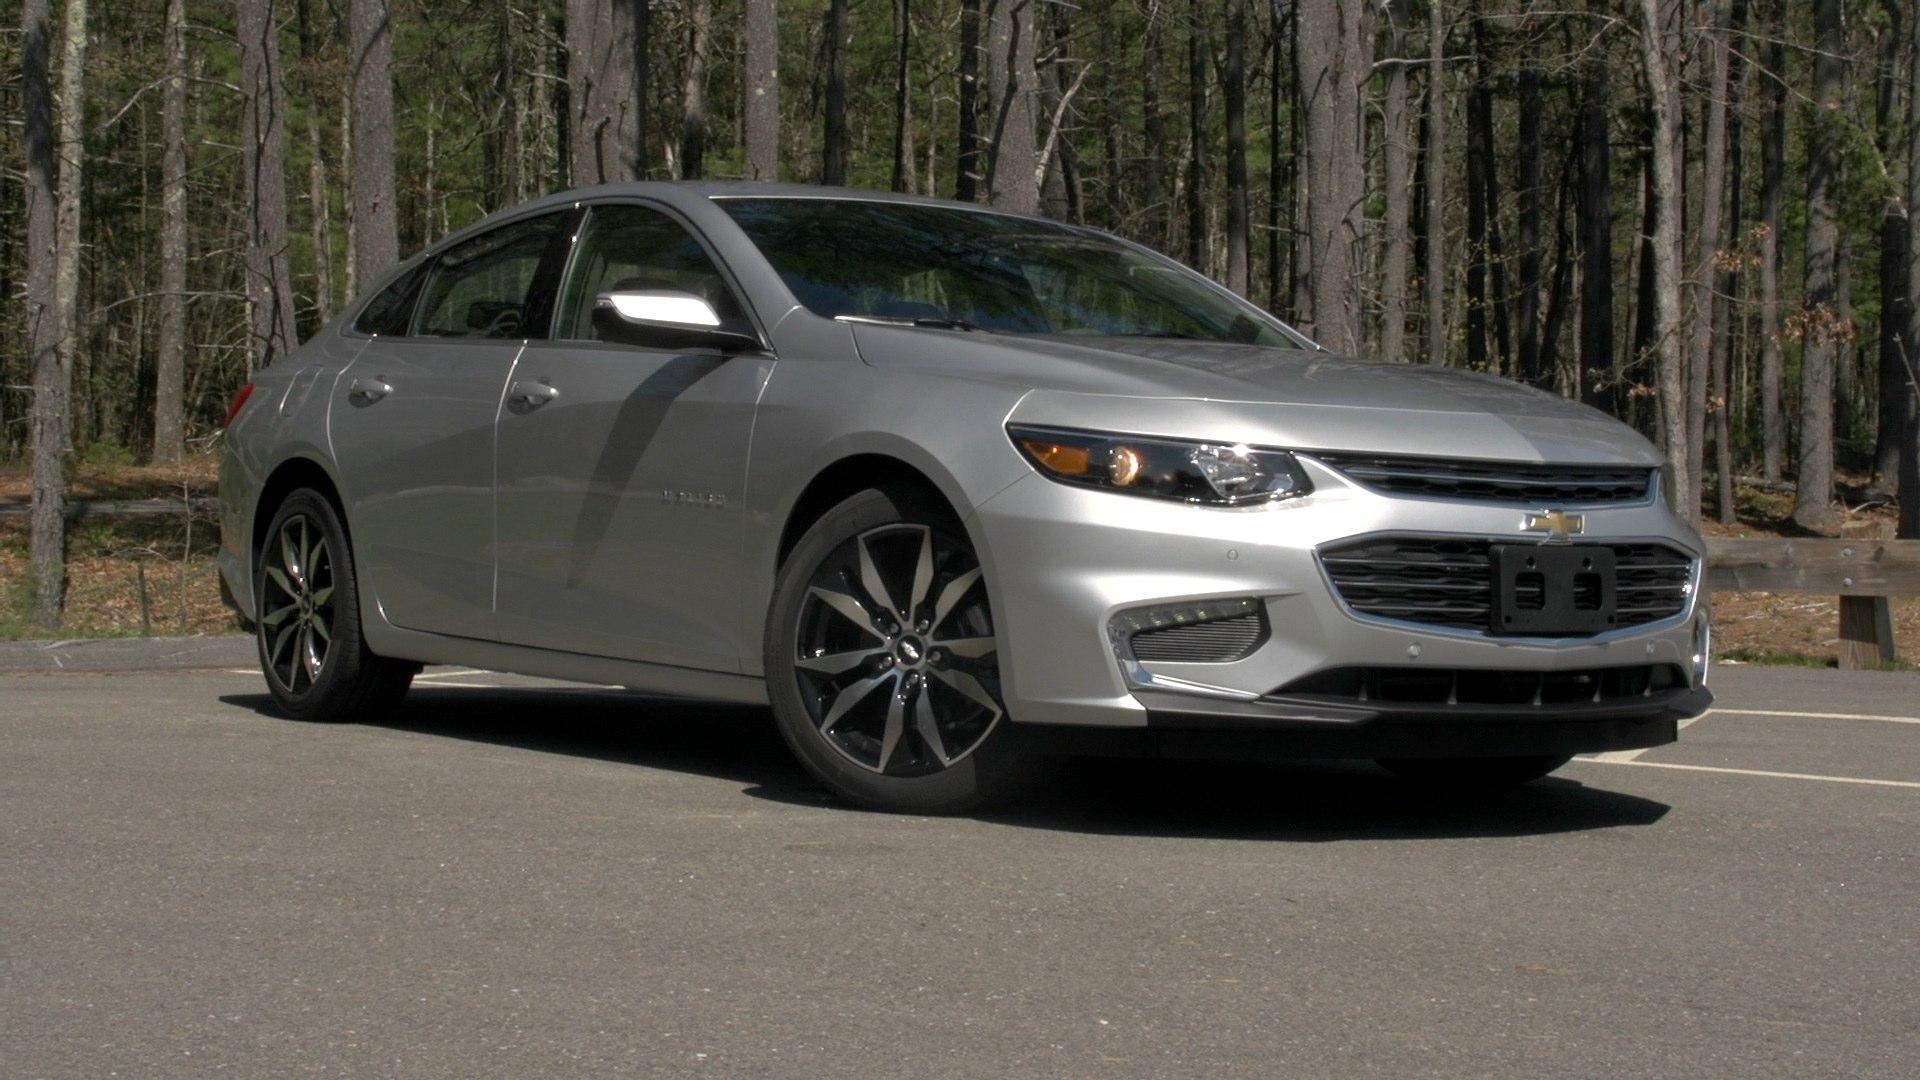 2017 Chevrolet Malibu Videos